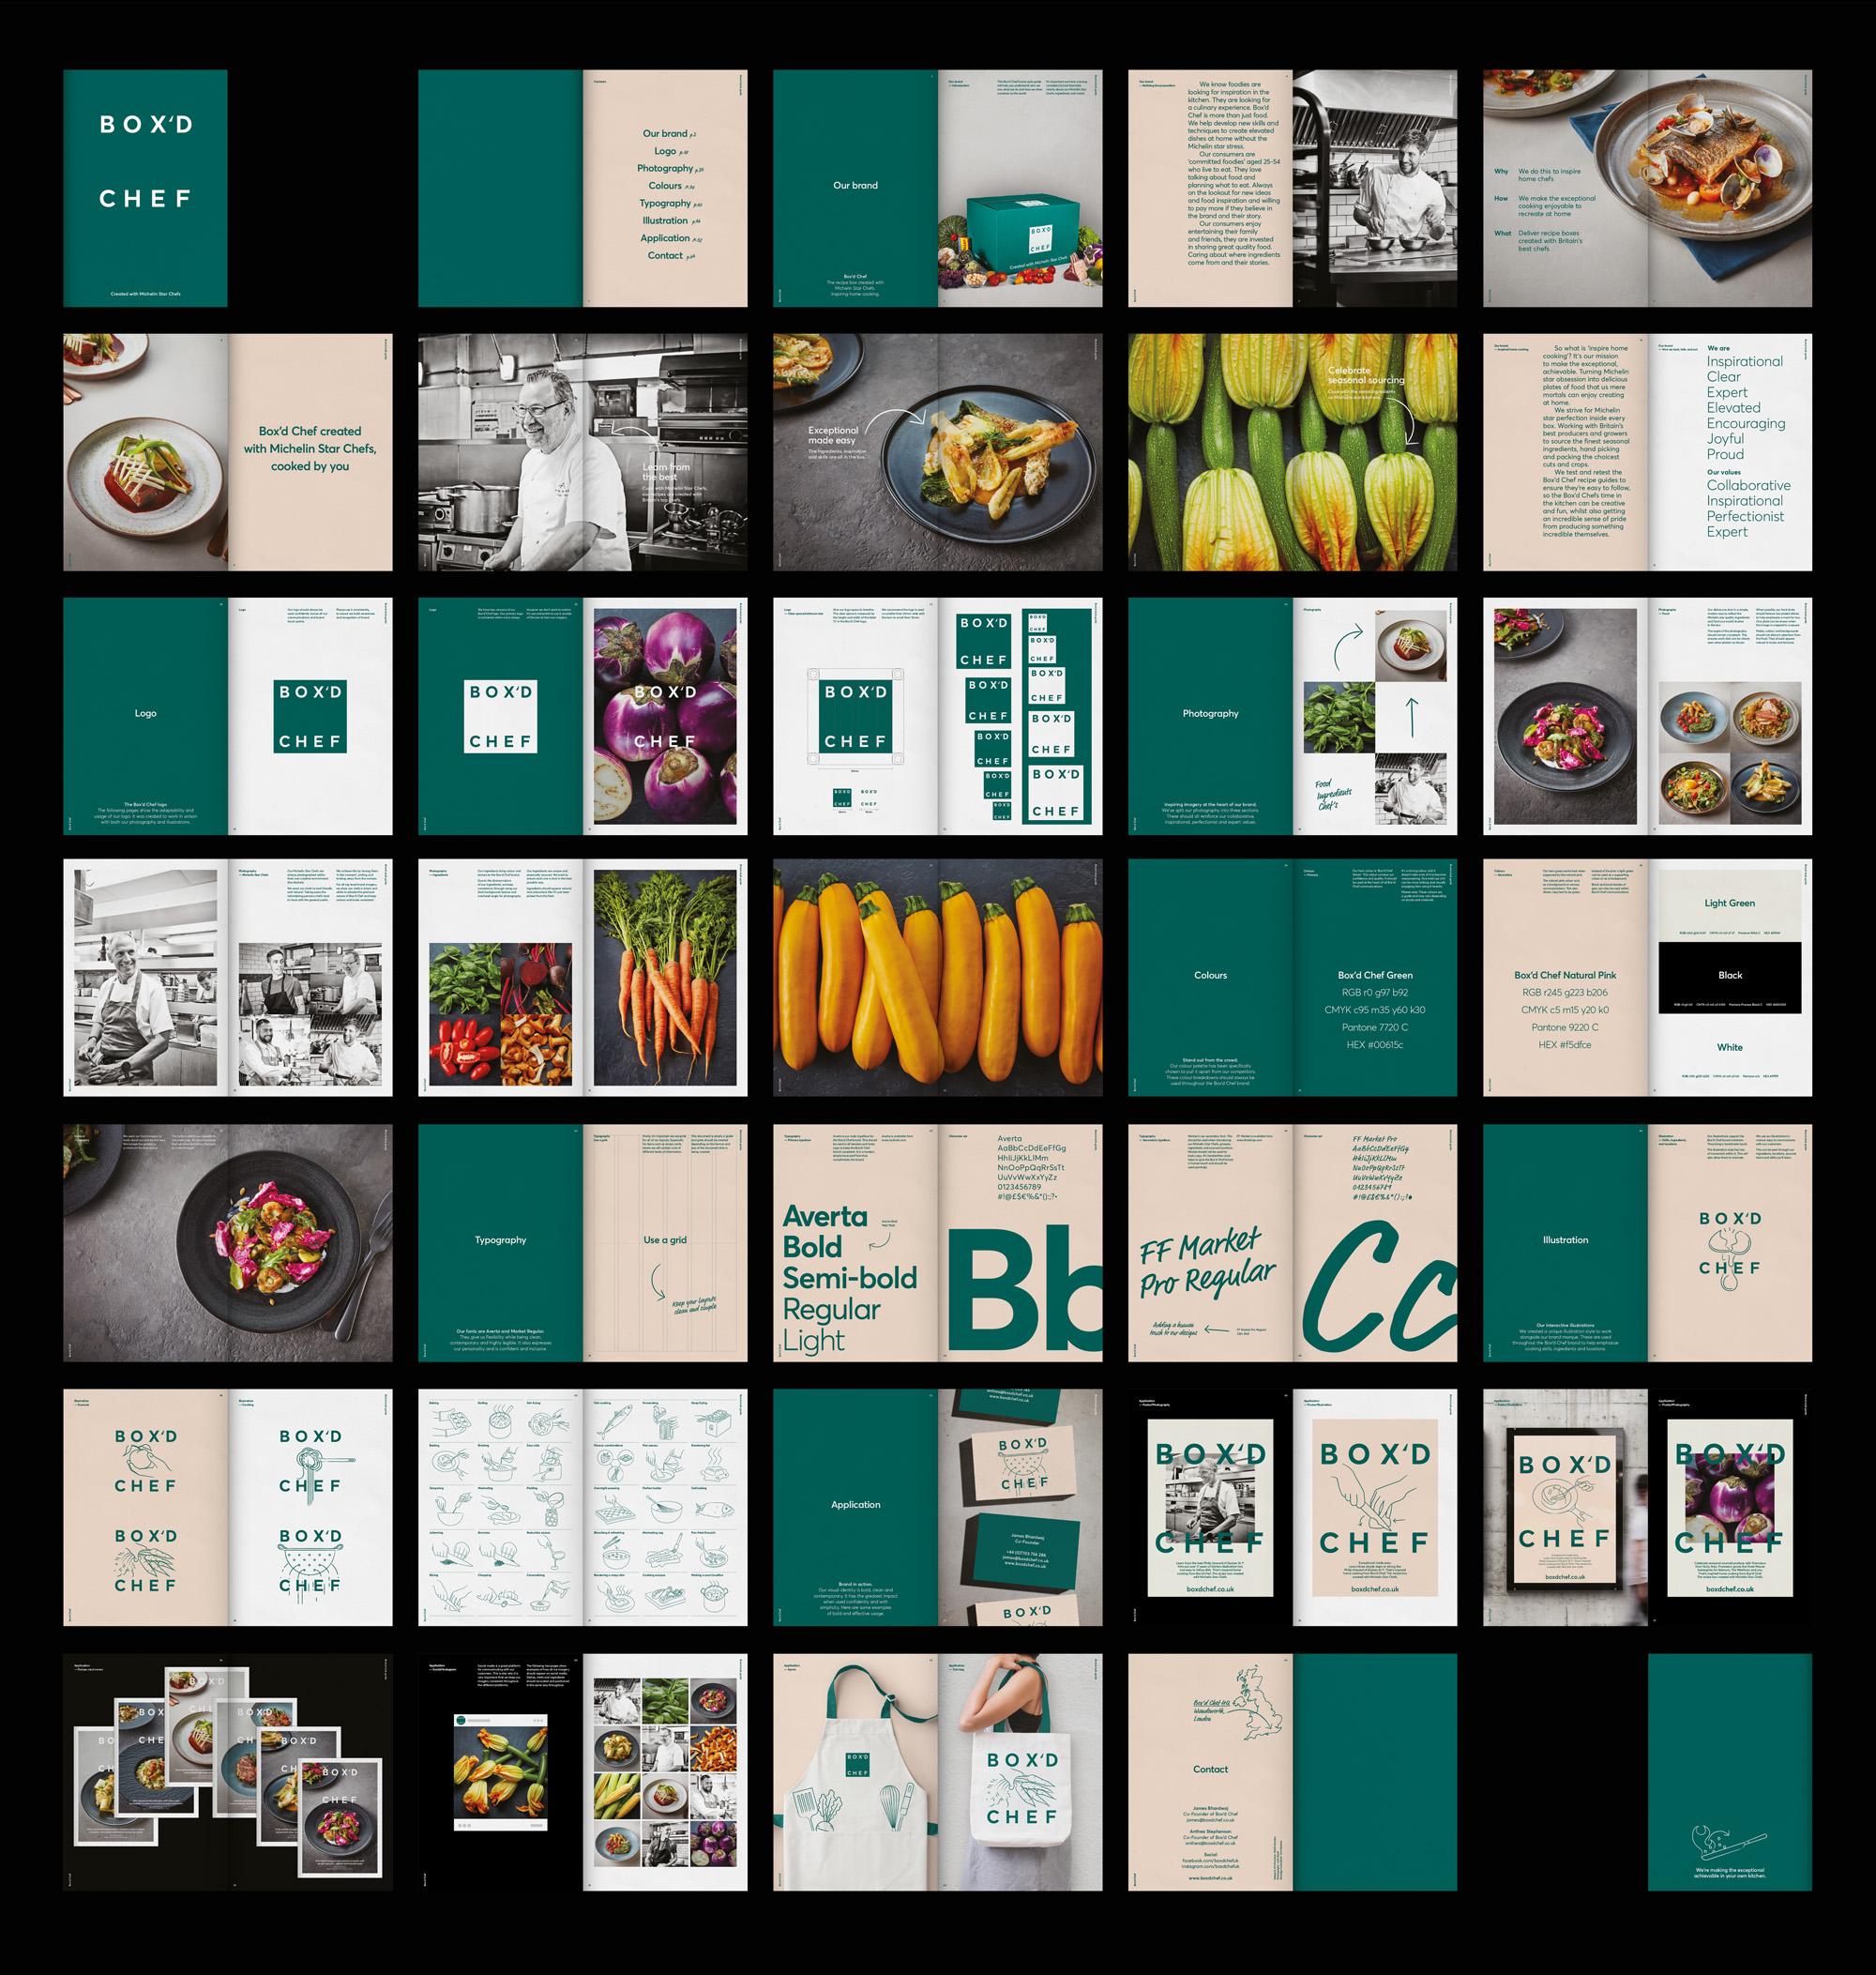 NotOnSunday-Boxd-Chef-Branding-brandguidelines-black